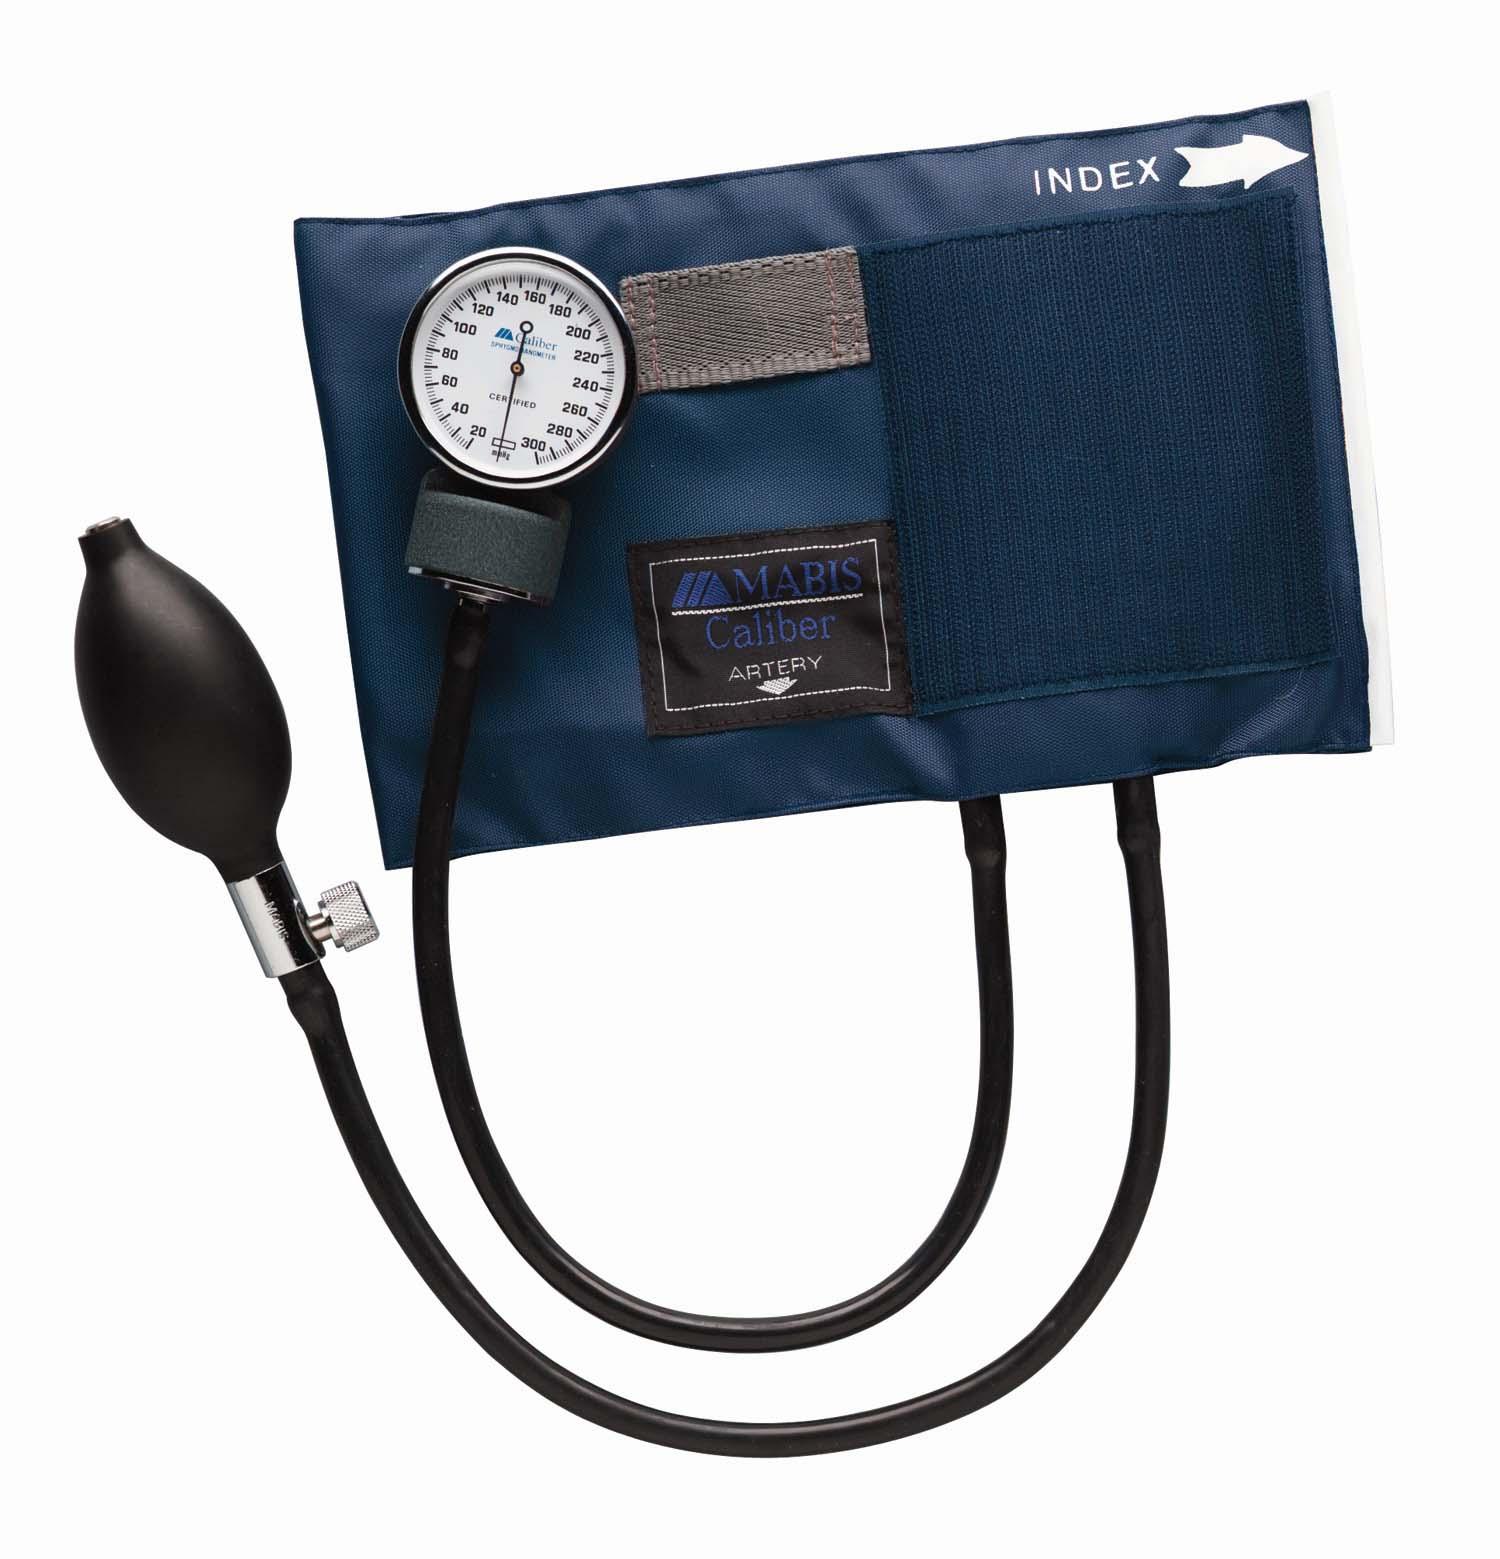 caliber-aneroid-sphygmomanometer-blue-nylon-cuff-adult-01-130-011-lr.jpg